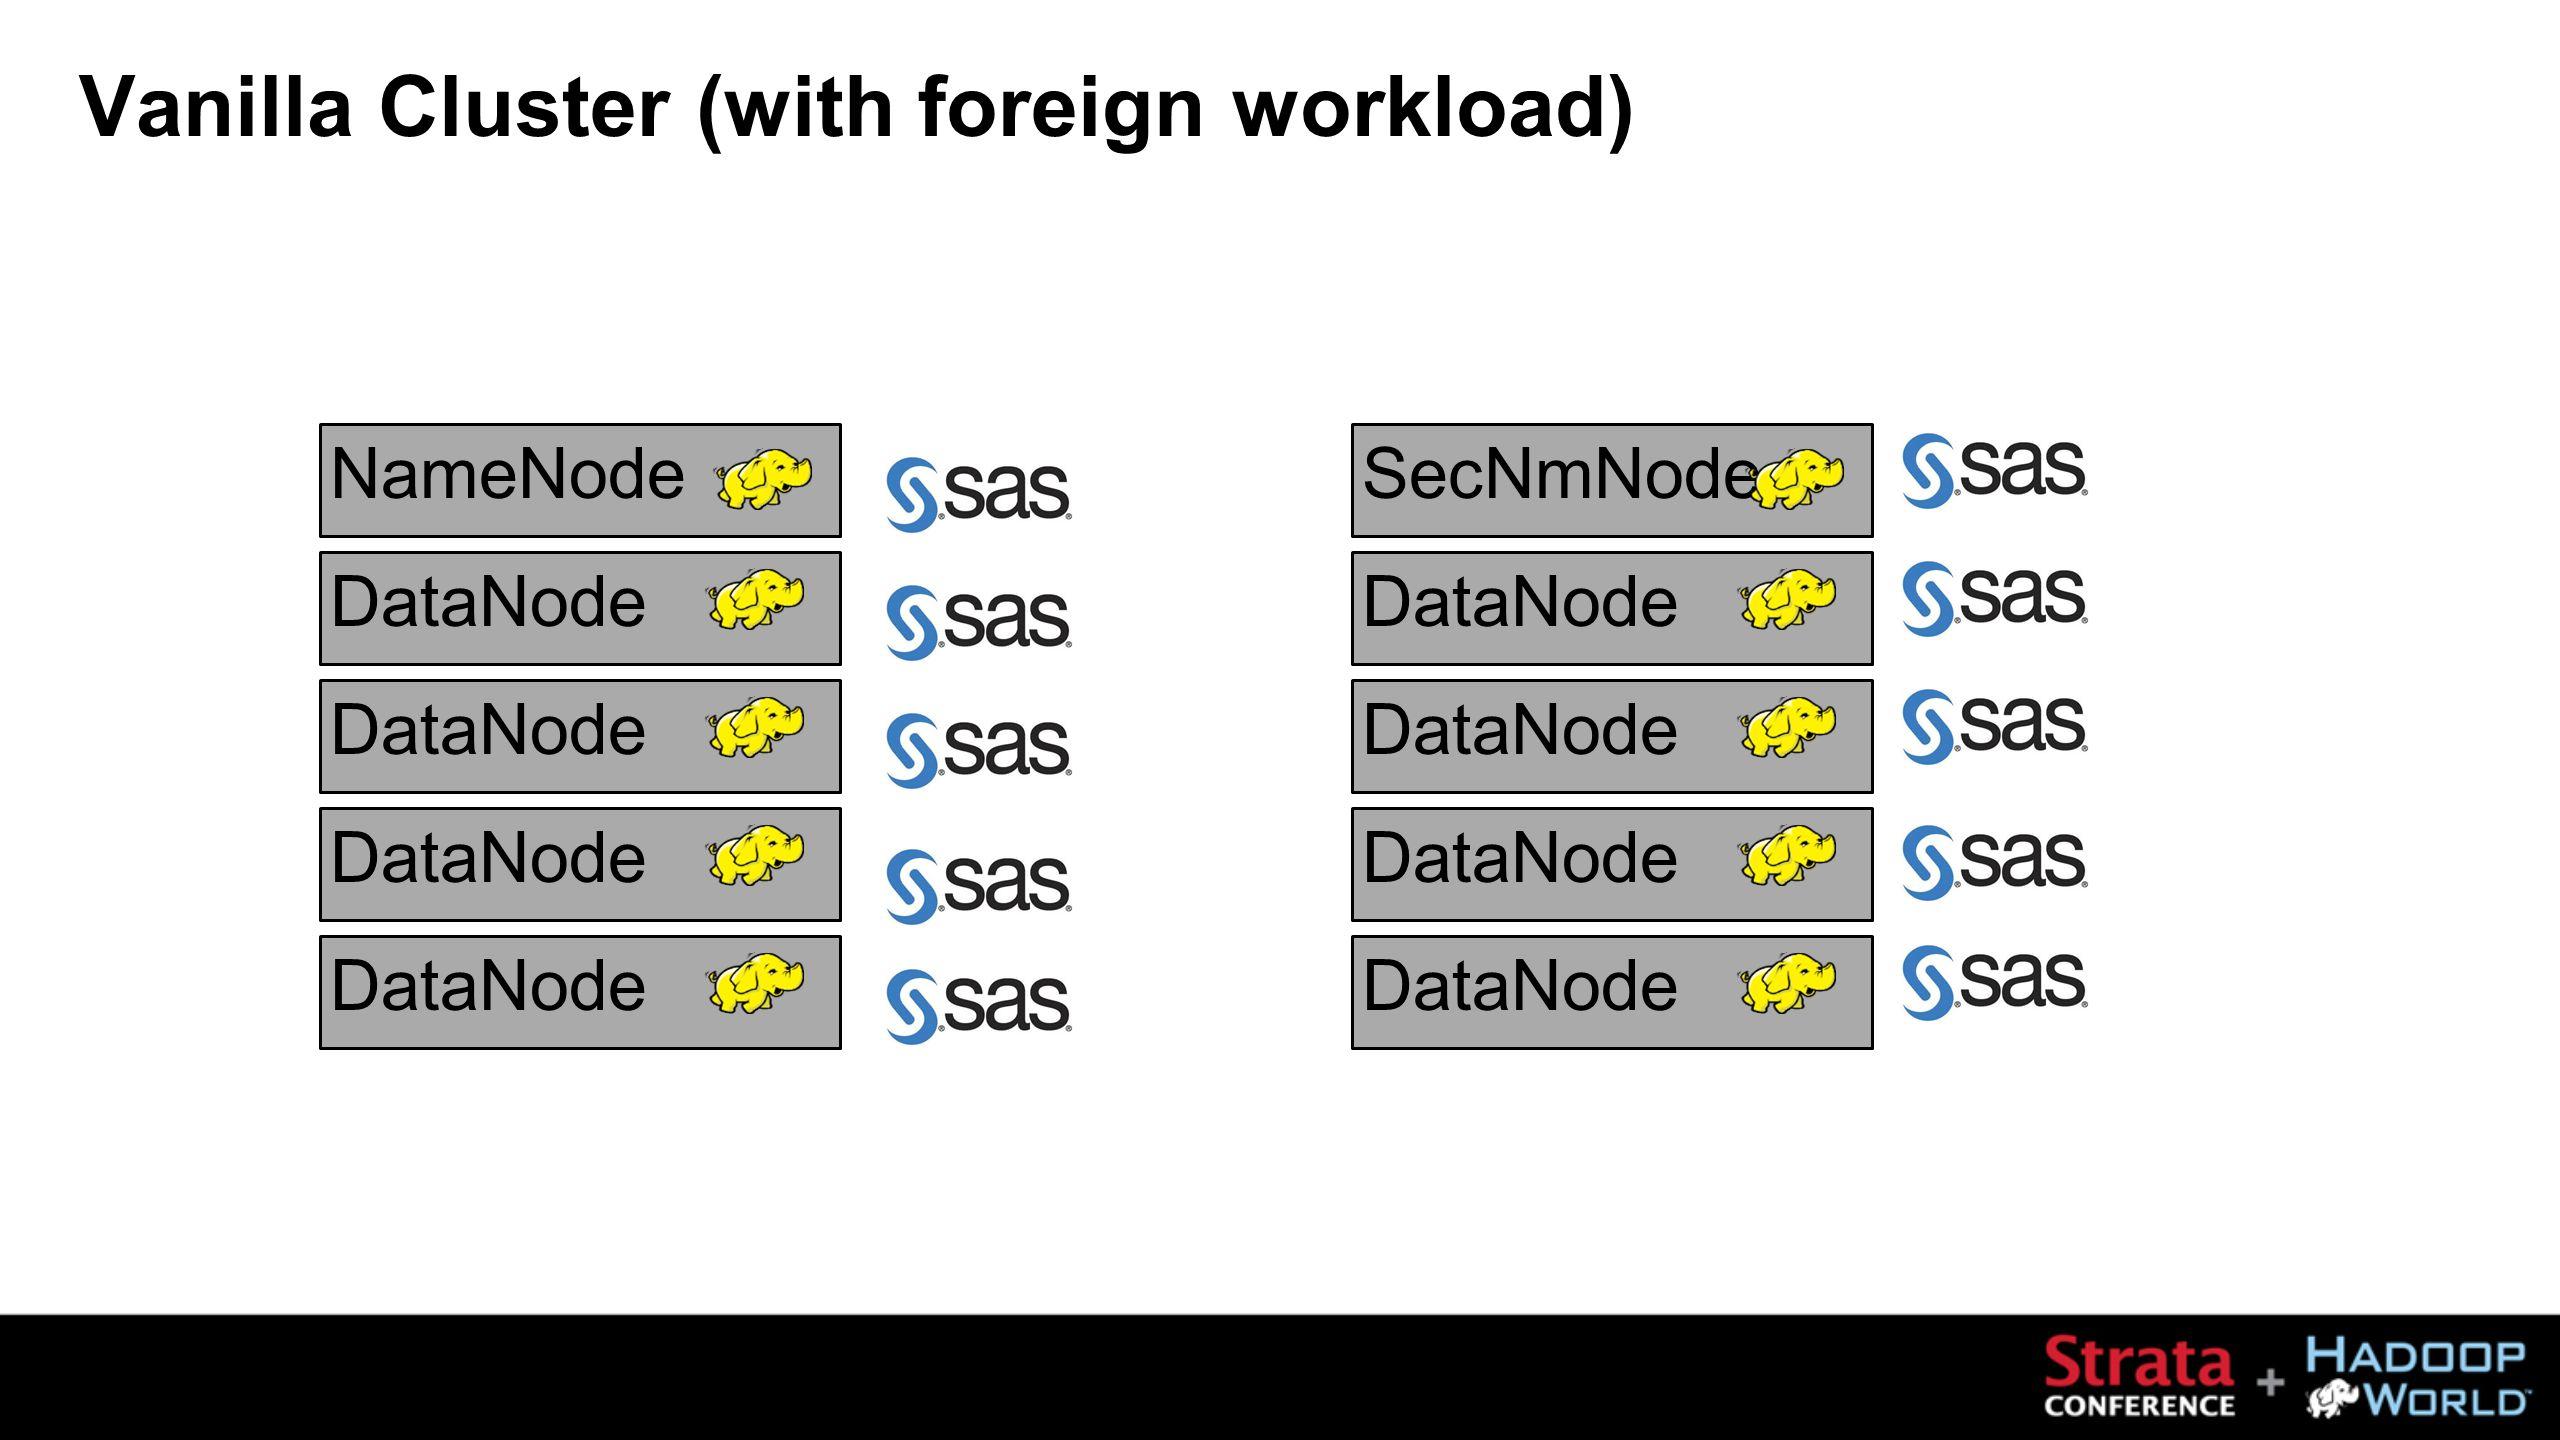 NameNodeDataNode SecNmNodeDataNode Vanilla Cluster (with foreign workload)